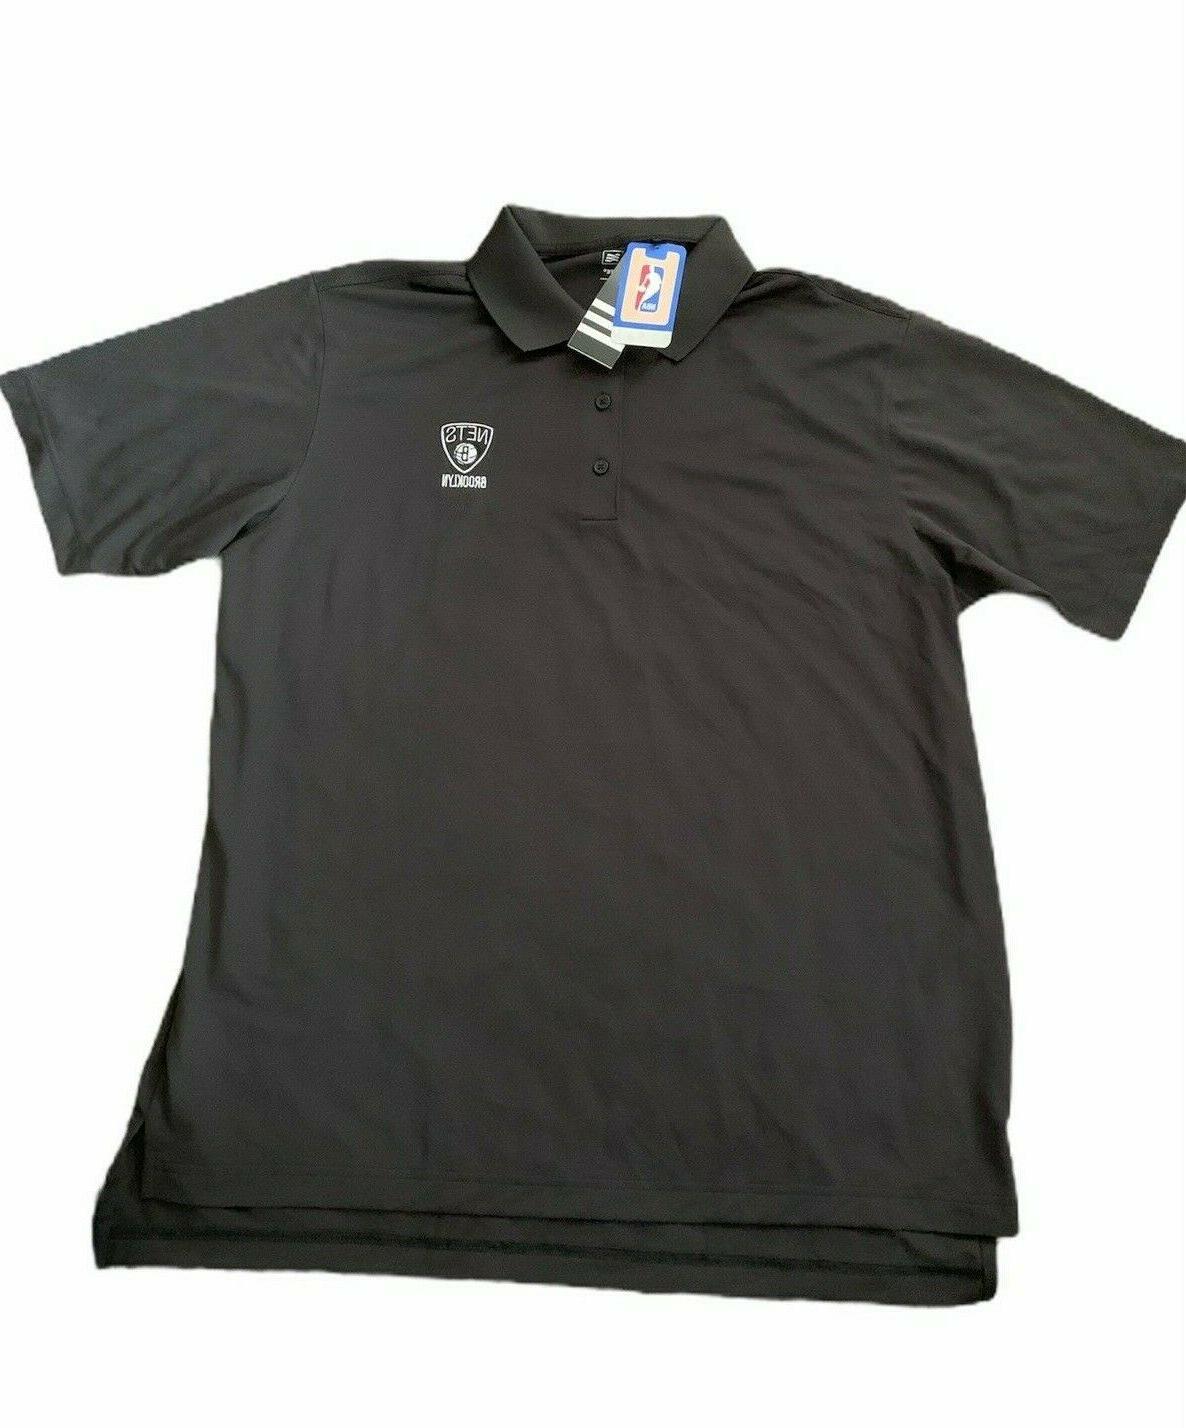 NBA Mens Basketball Large Black Shirt